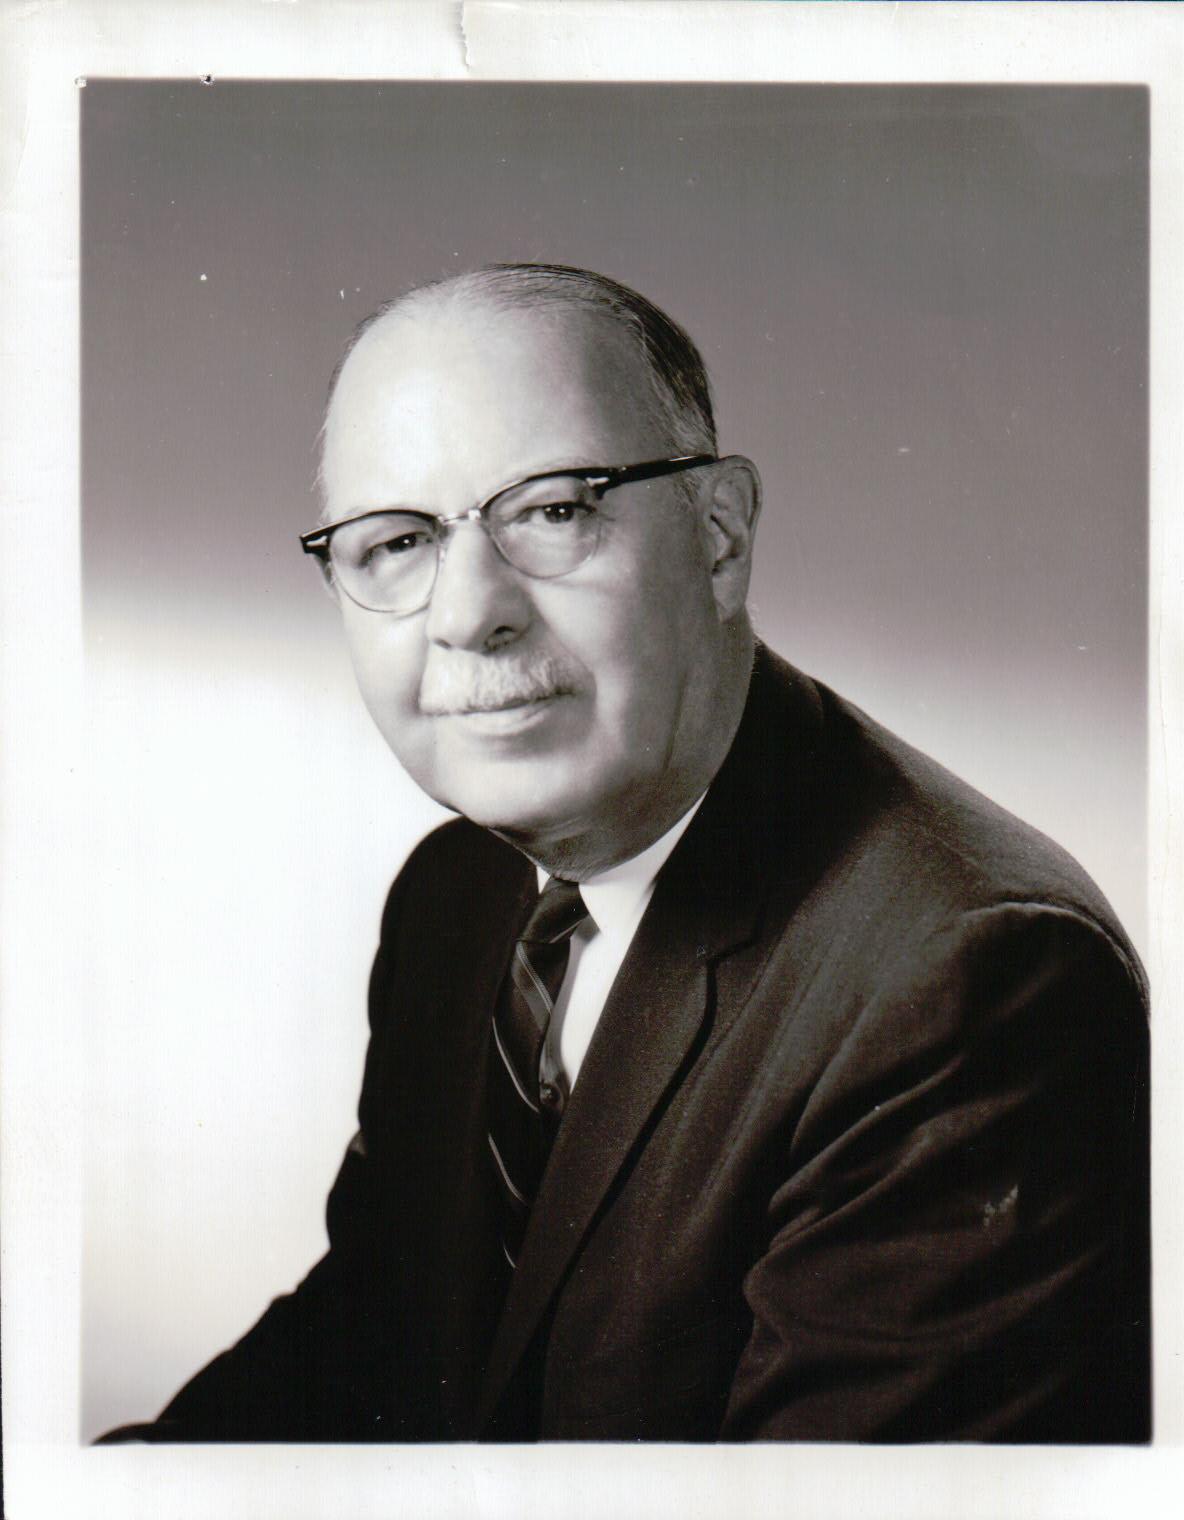 Flanders Bill 1965 retirement